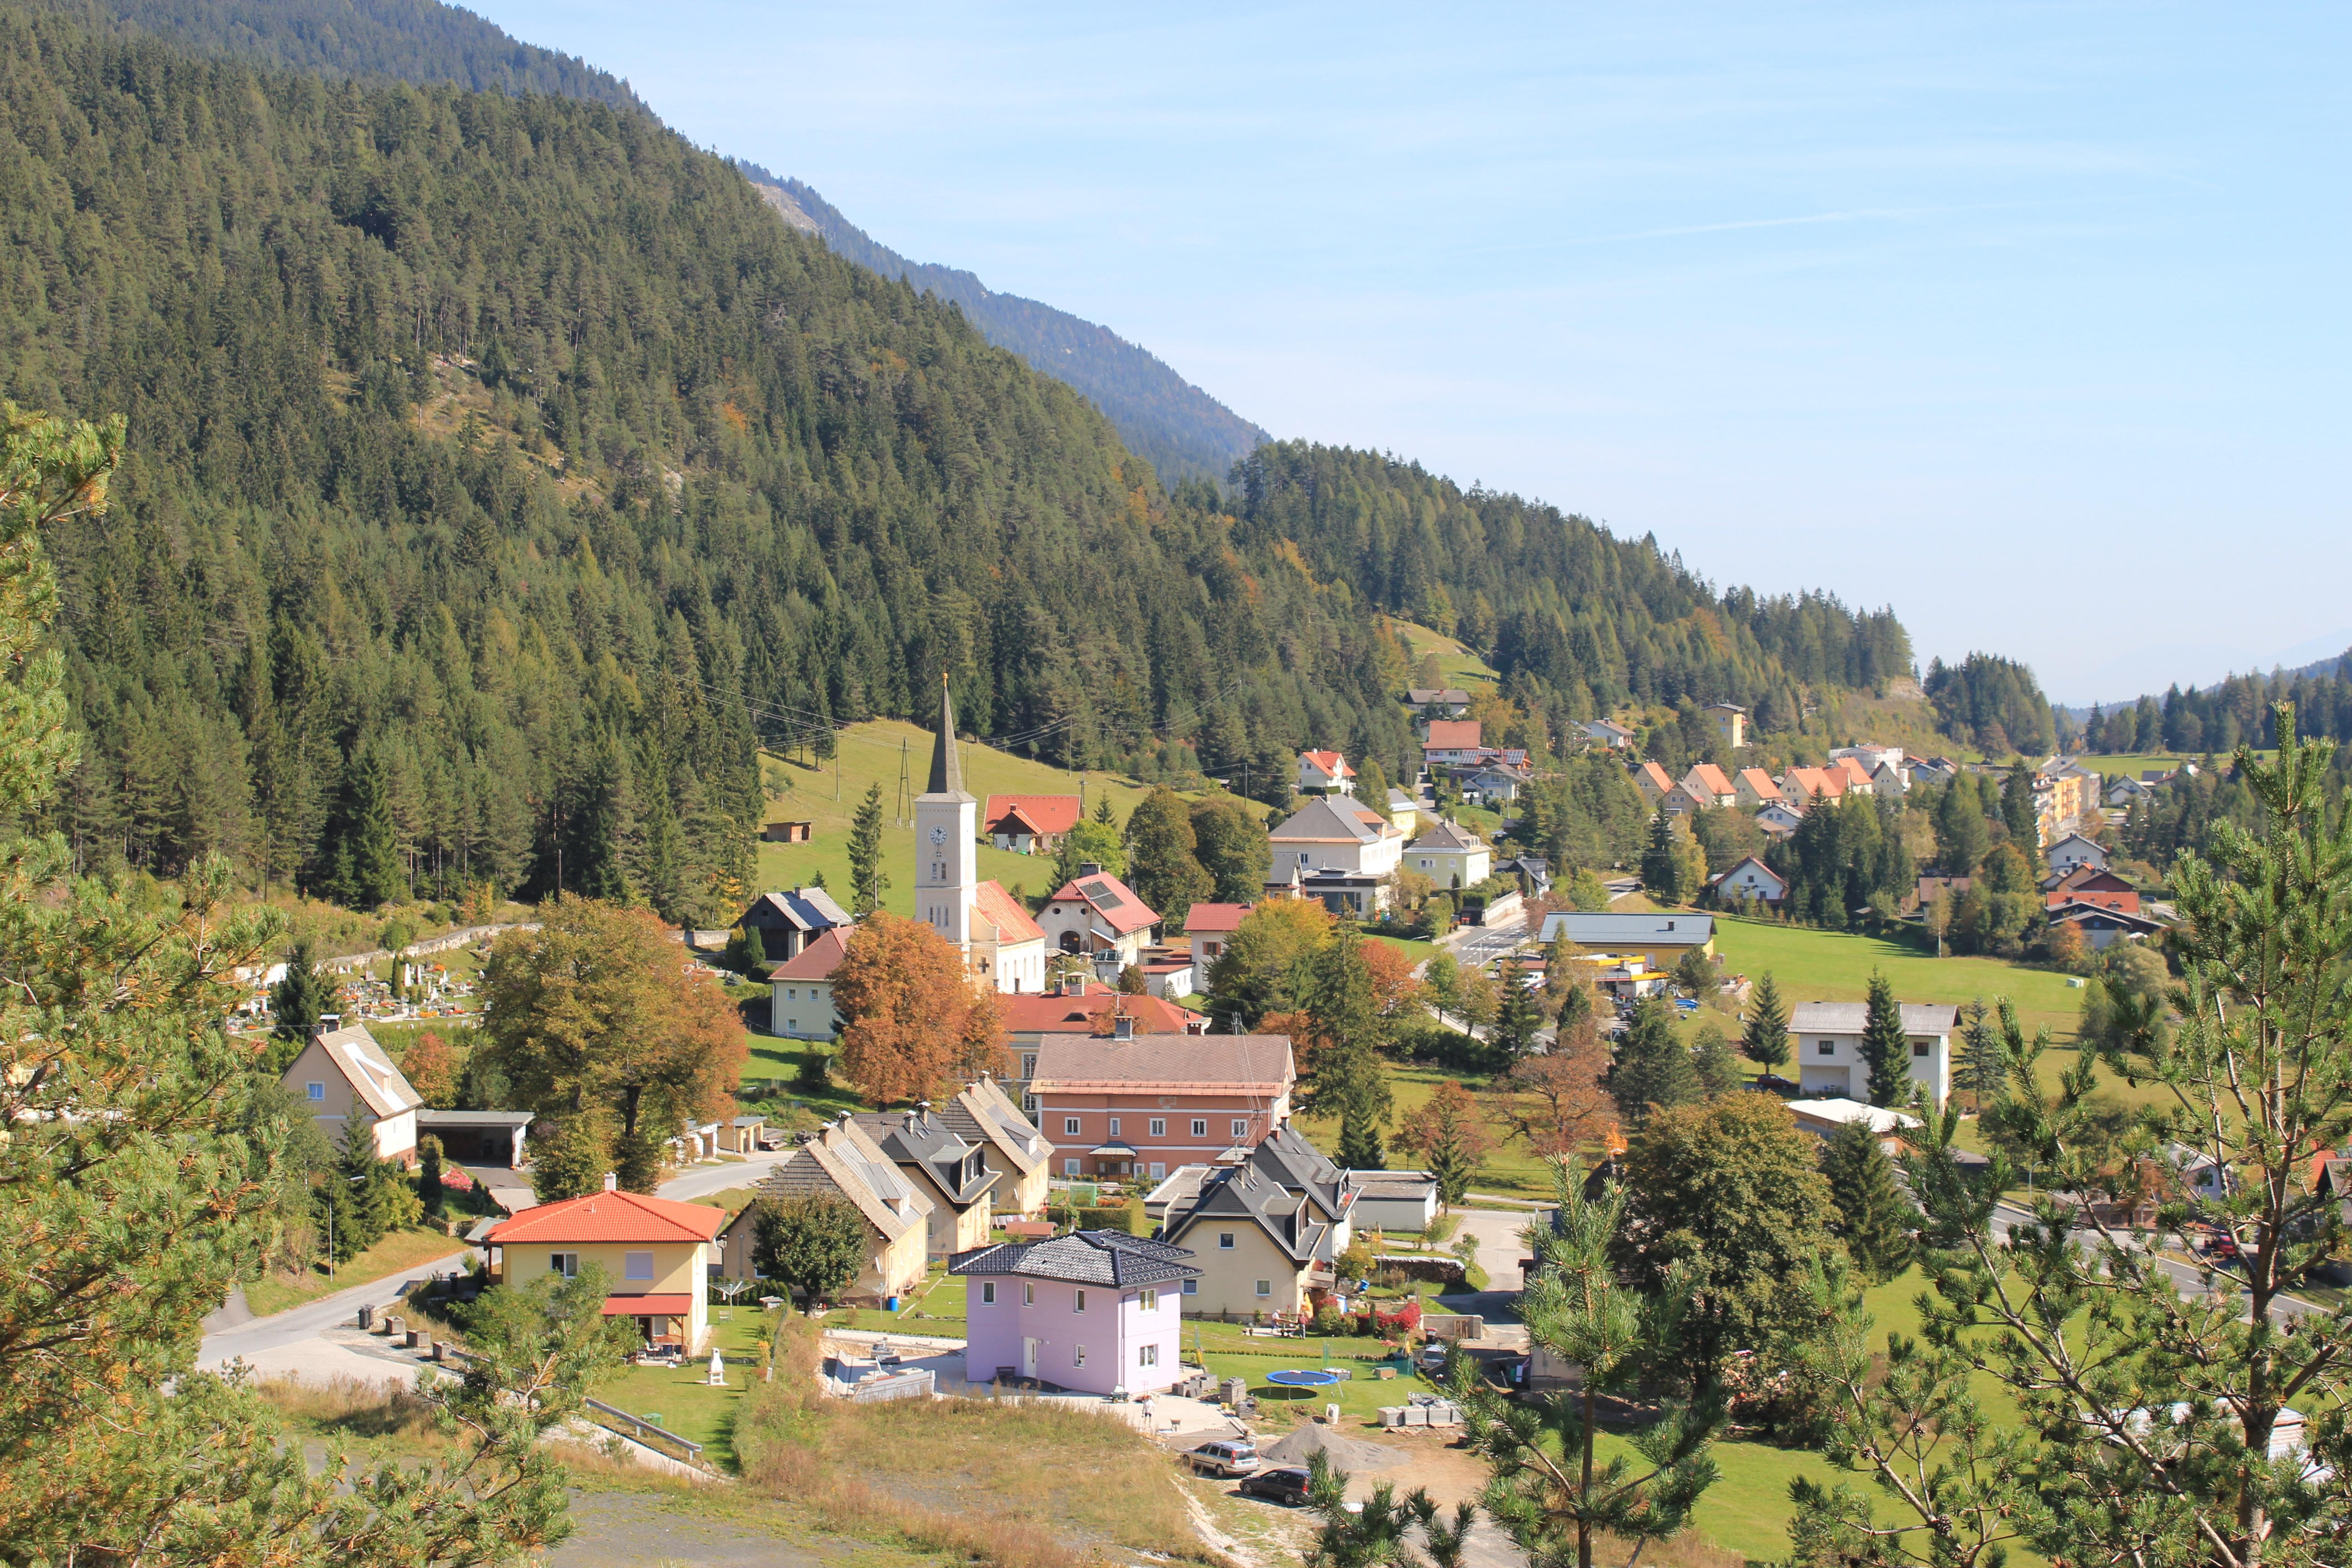 Villach - Singen im Berg - forsale24.net